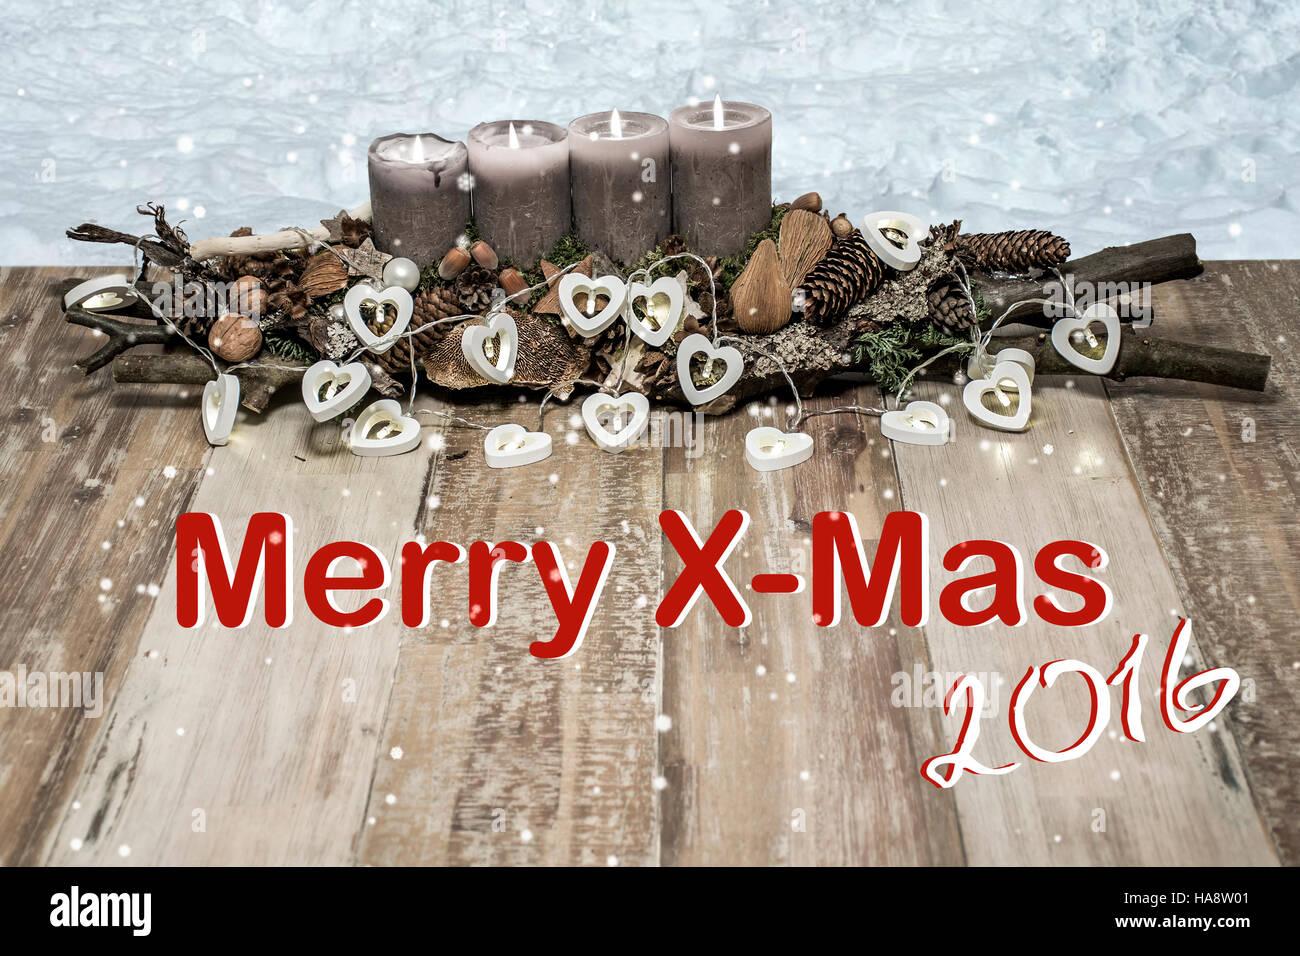 Merry X Mas Stockfotos & Merry X Mas Bilder - Alamy